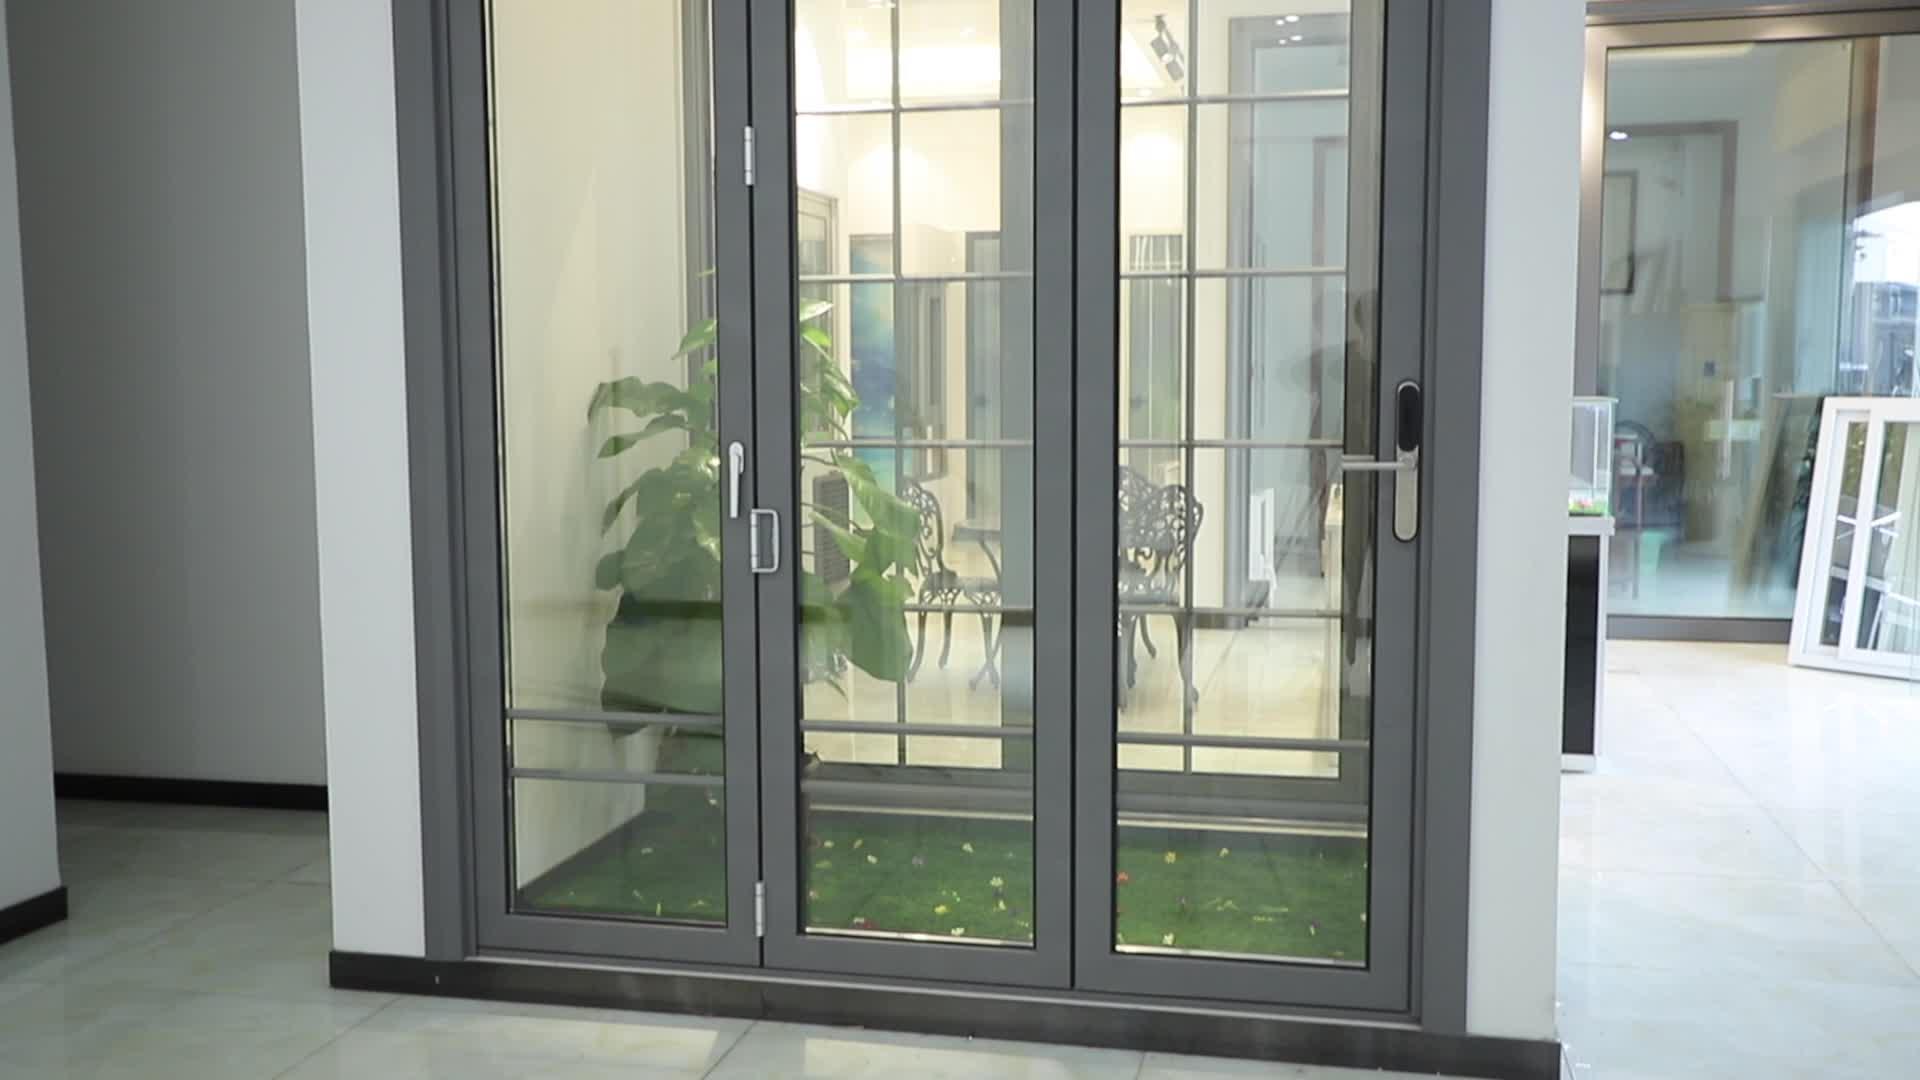 Aluminium Glas Vouwen Patio Deur Patio Exterieur Bifold Deuren Dubbele Beglazing Aluminium Bi Vouwdeuren